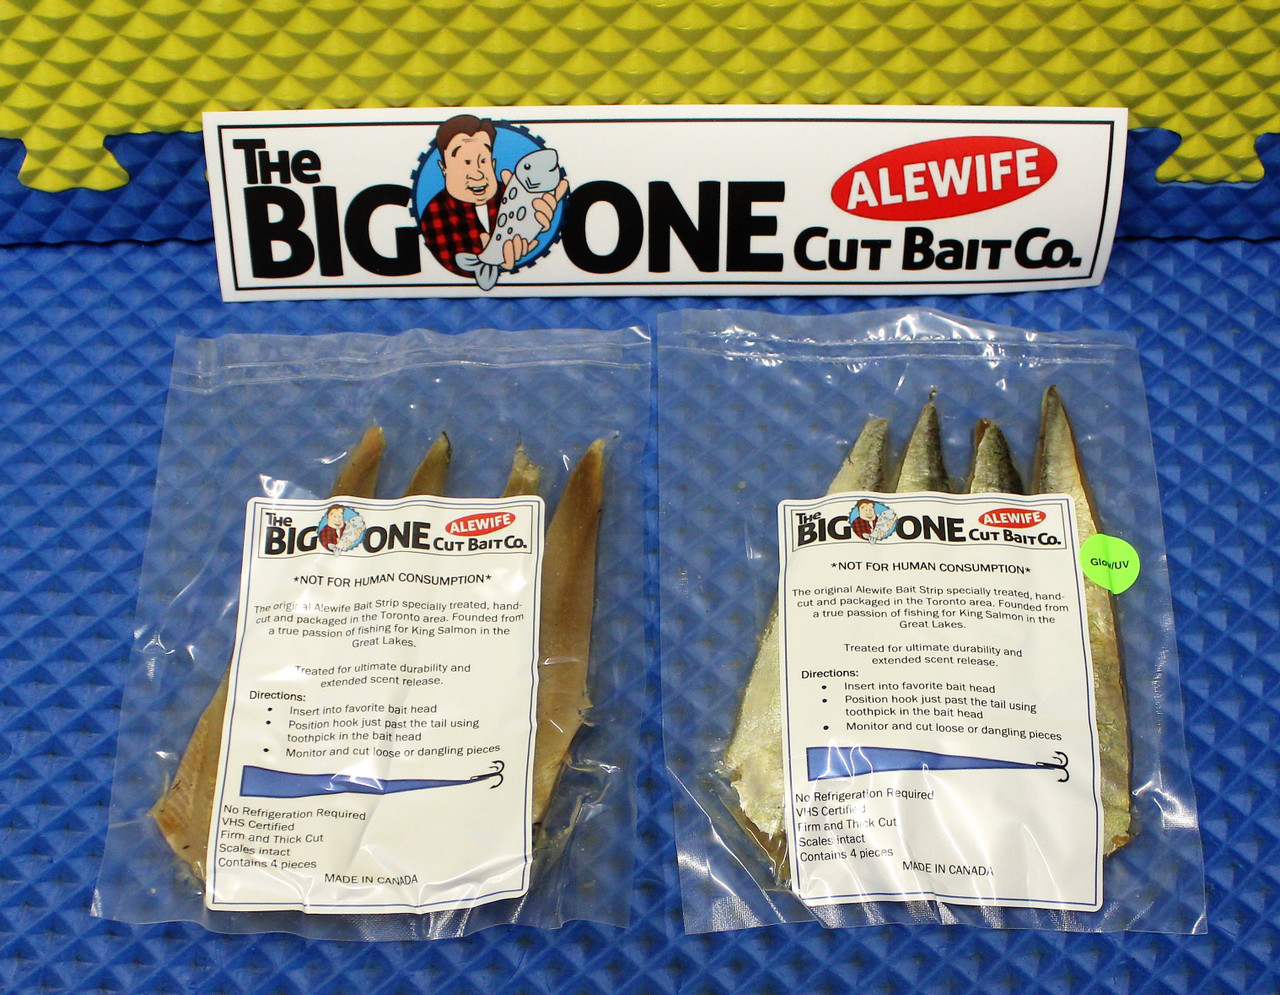 The Big One Cut Bait Co. Alewife CHOOSE YOUR CUT!